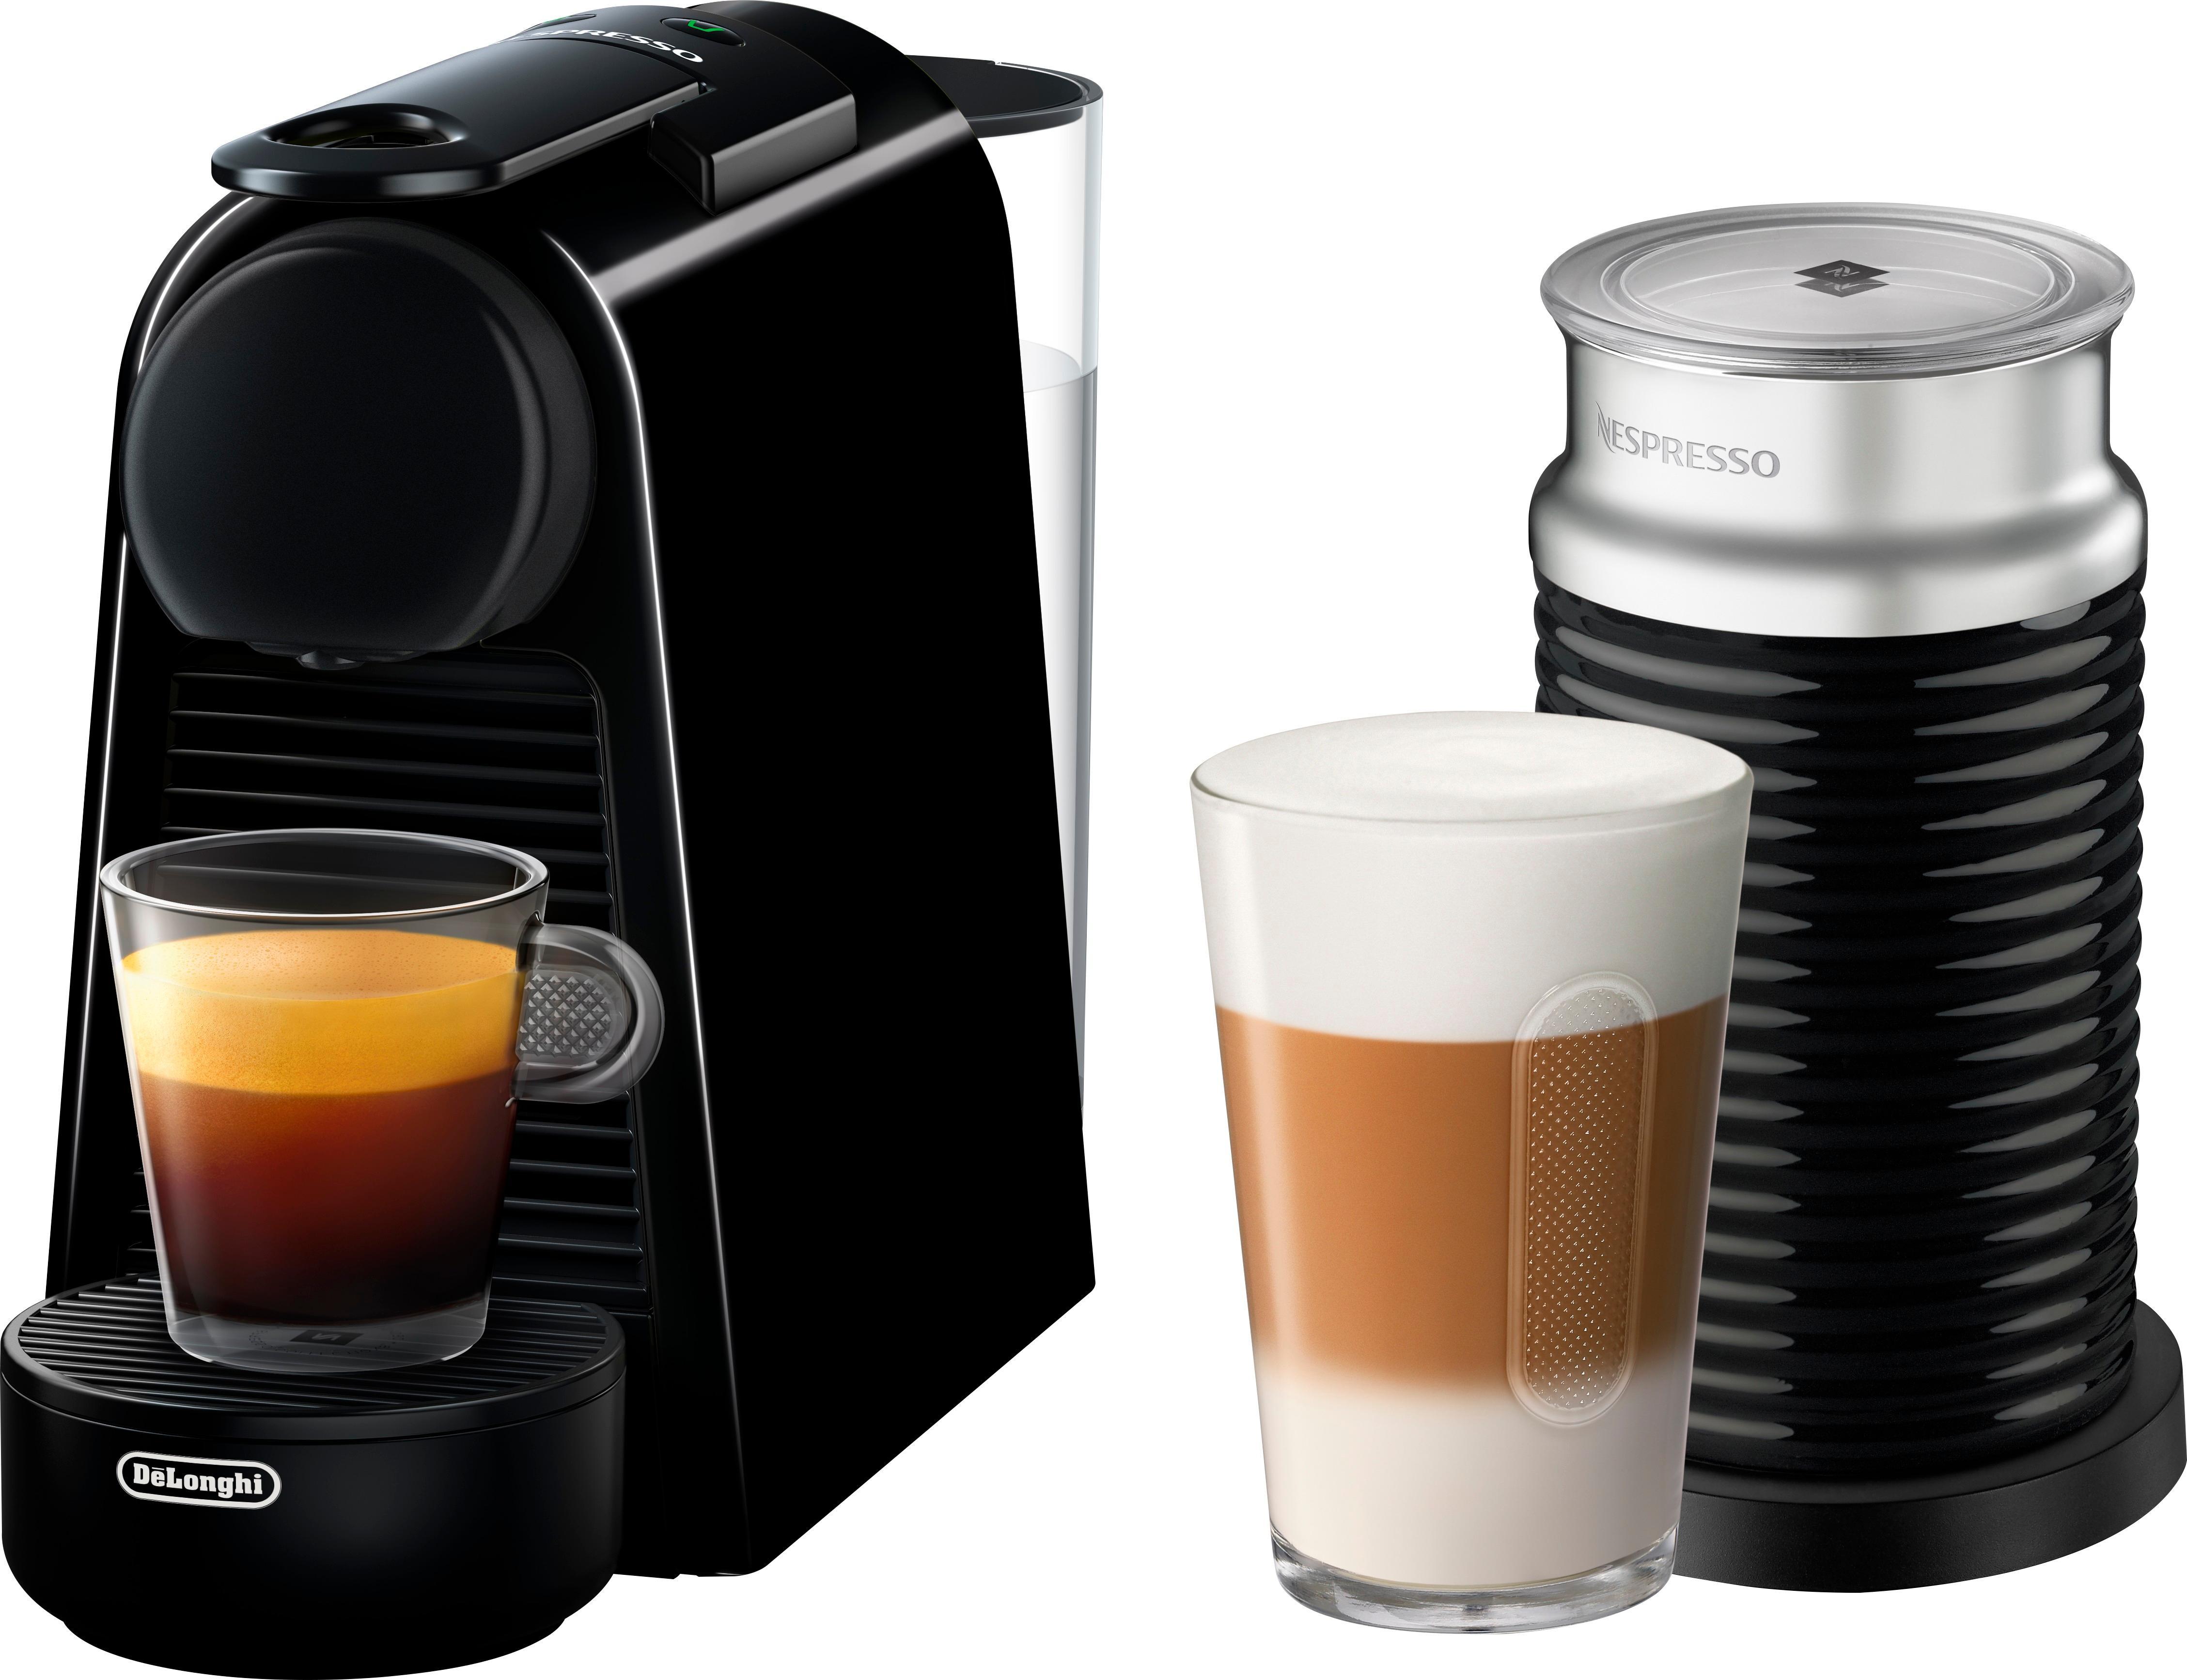 DeLonghi - Essenza Mini Coffeemaker - Black 5934814